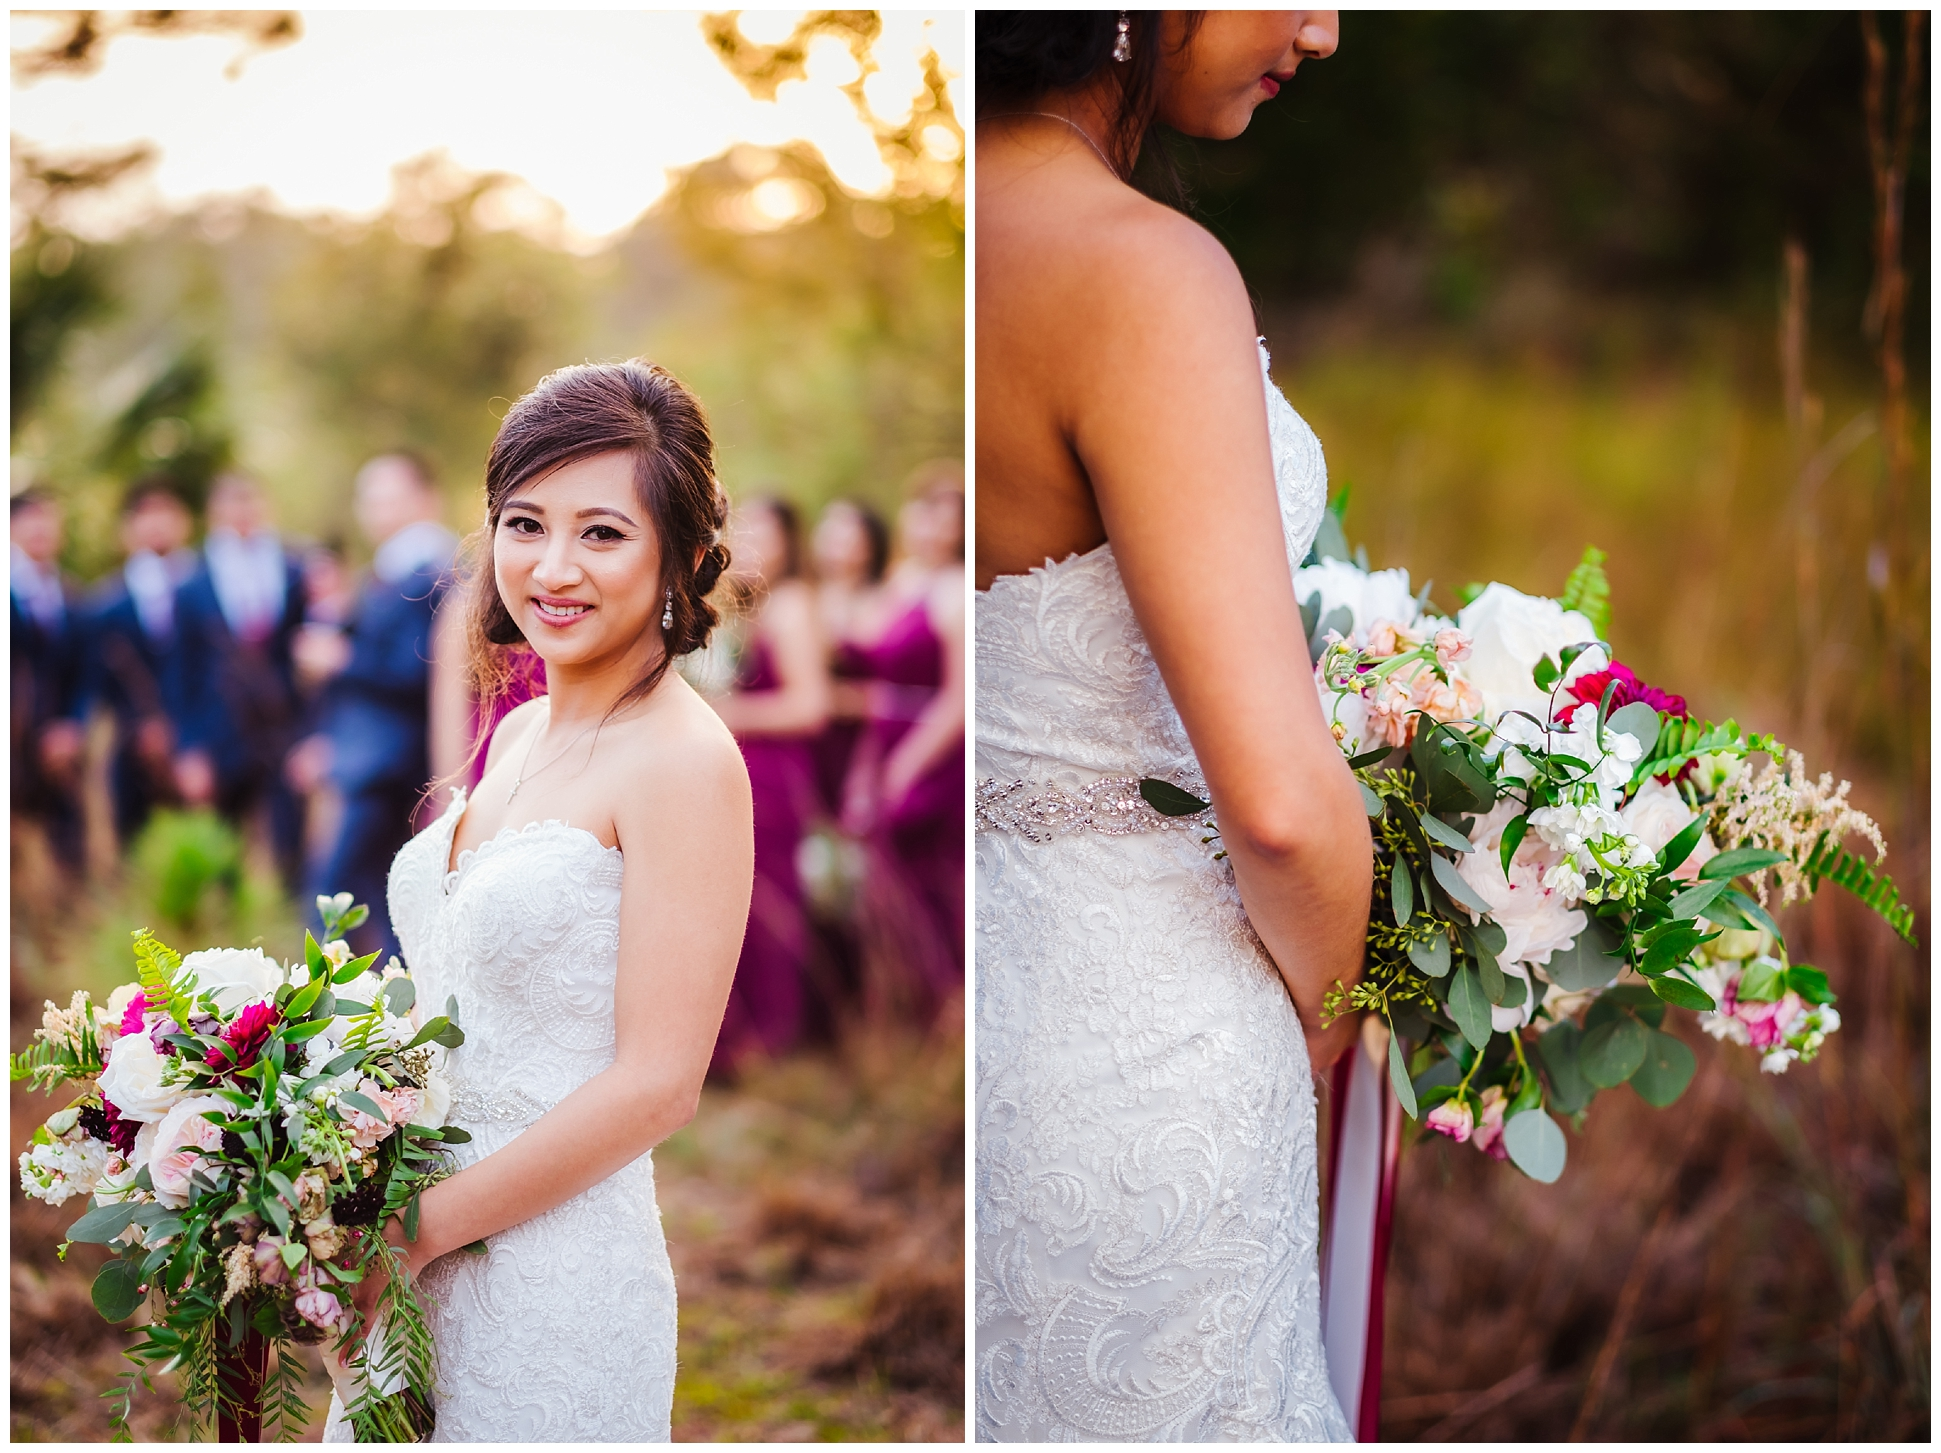 tampa-wedding-photographer-philipino-colorful-woods-ballroom-church-mass-confetti-fuscia_0050.jpg